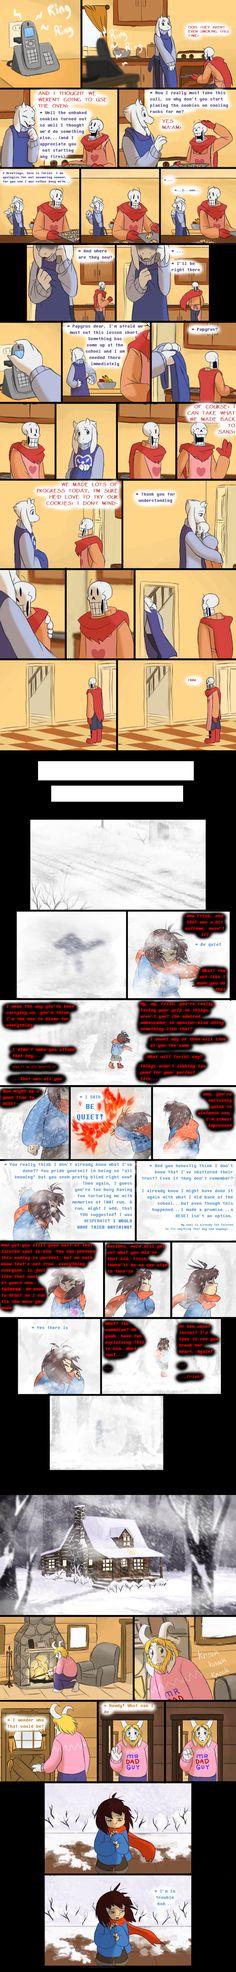 endertale___page_24_by_tc_96-db9ri0b.png (1129×9438)